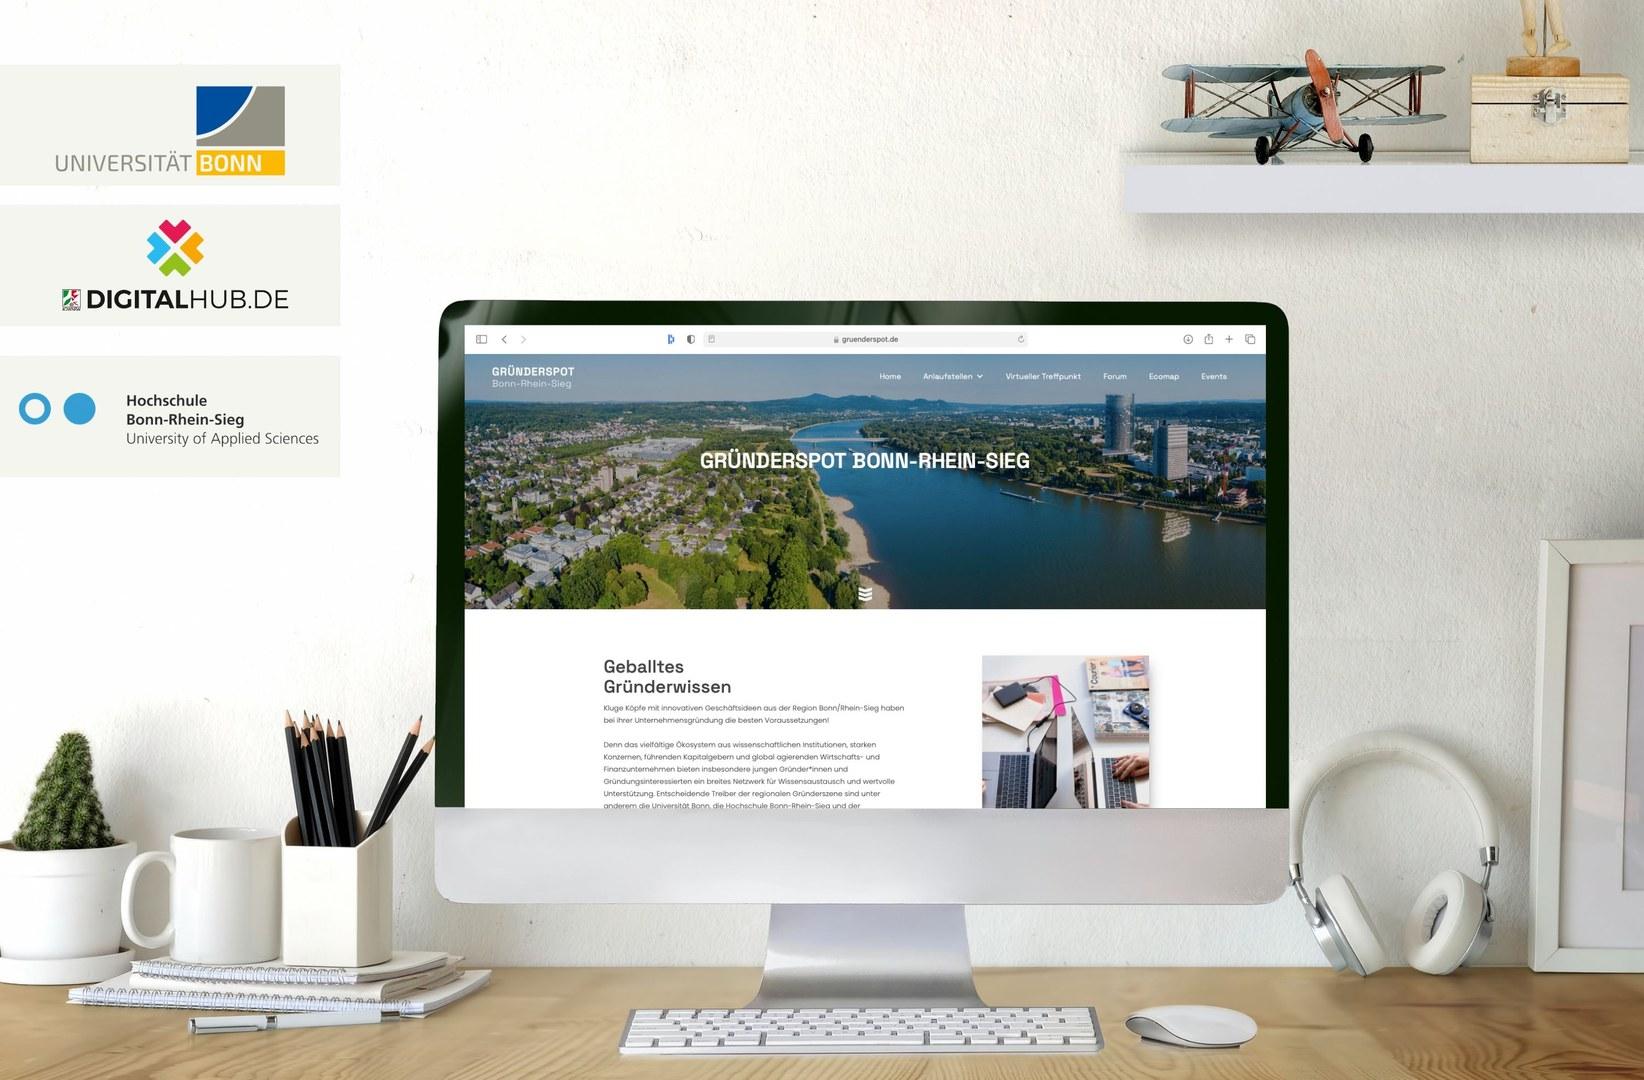 New internet platform gruenderspot.de